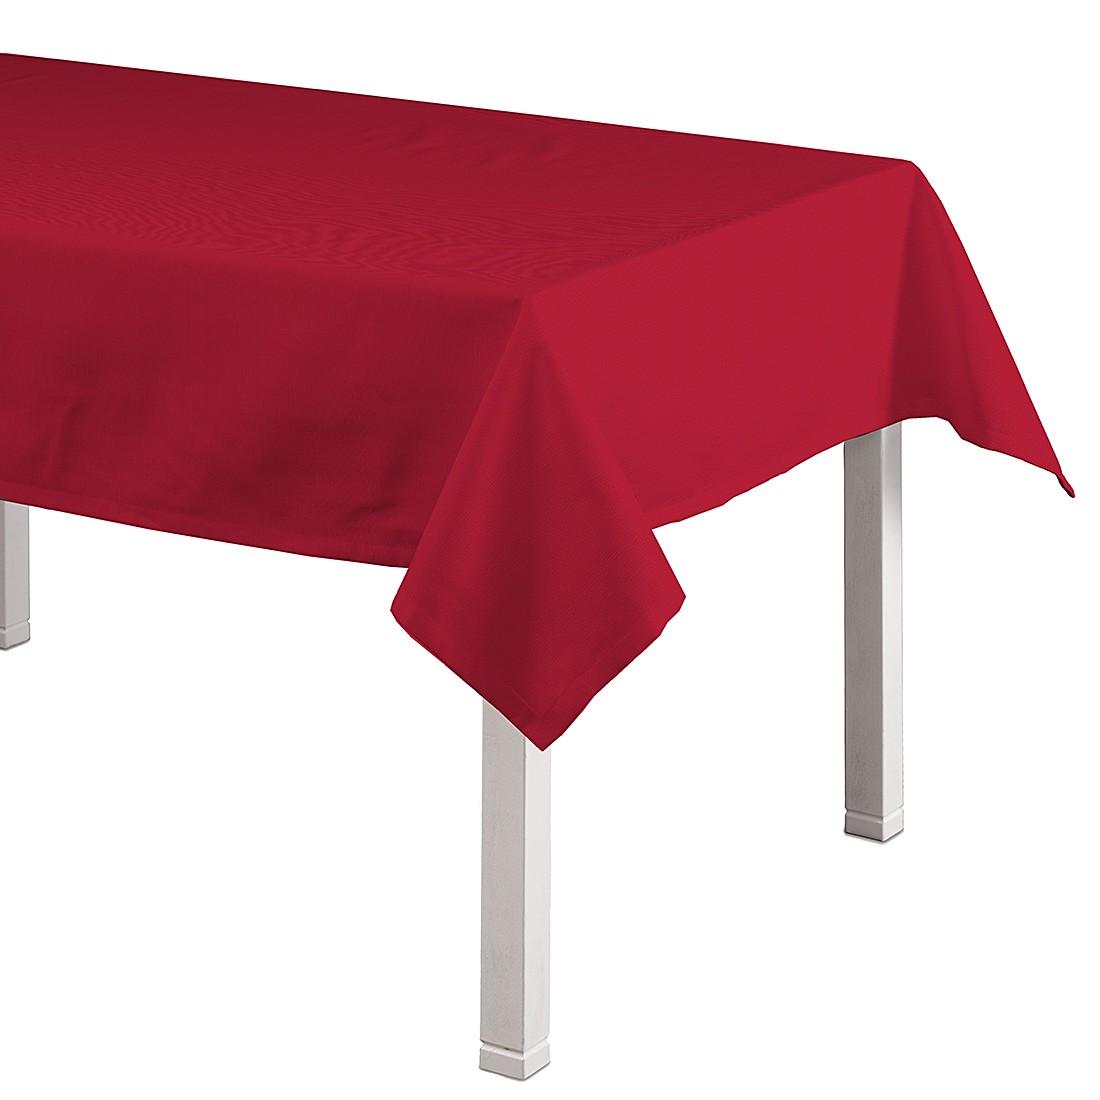 Tischdecke Cotton Panama – Rubinrot – 130 x 130 cm, Dekoria jetzt bestellen